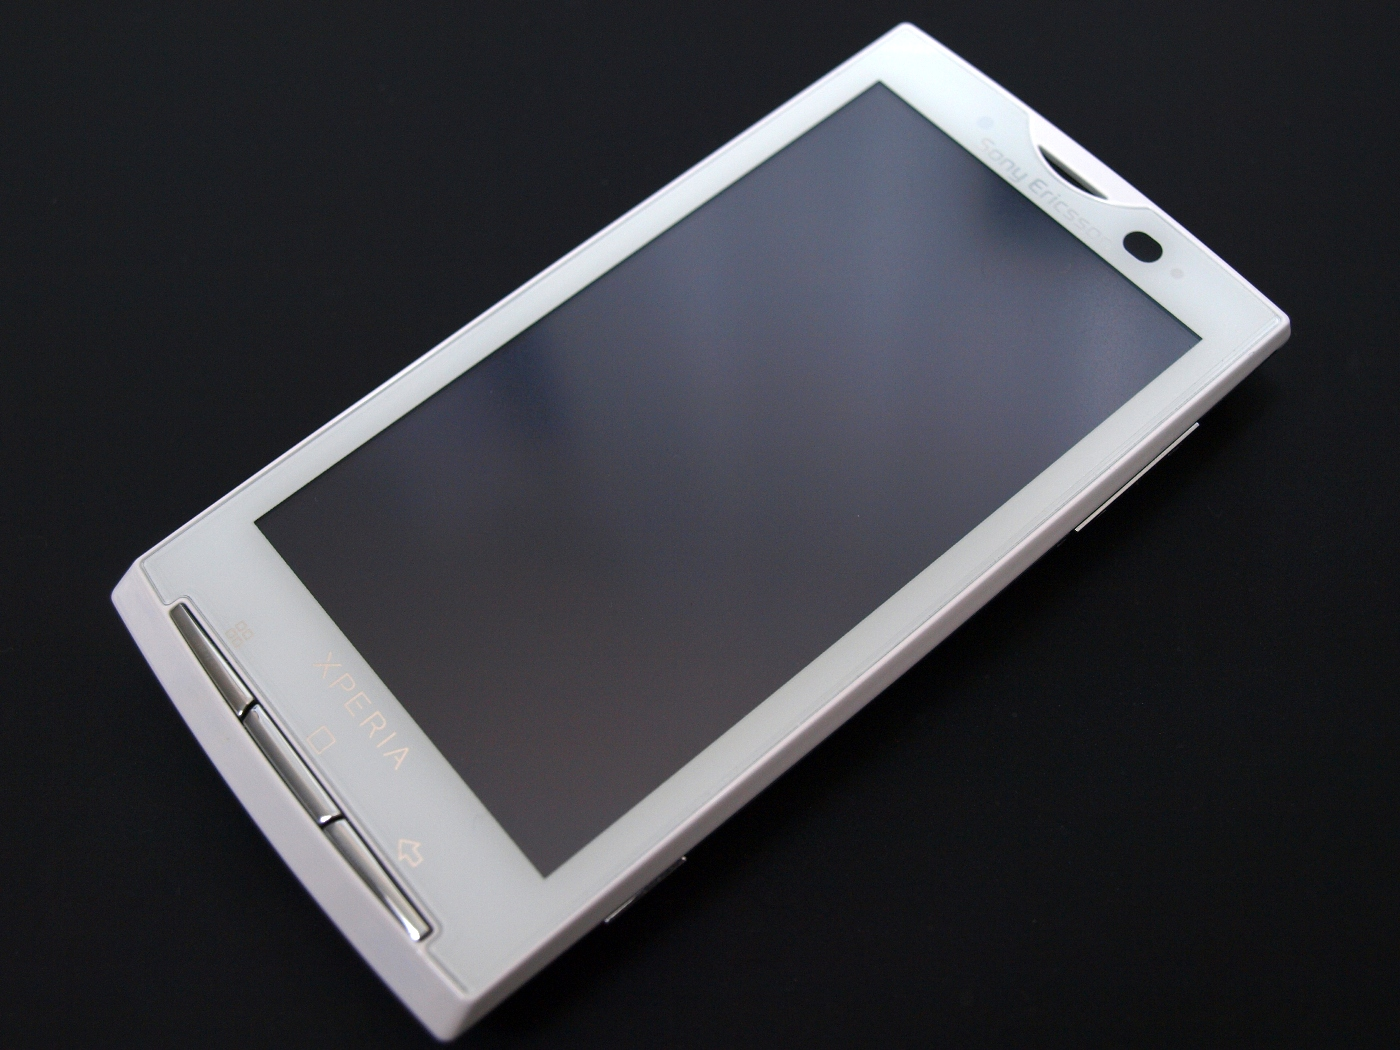 Sony Ericsson Xperia X10   Wikipedia  the free encyclopedia